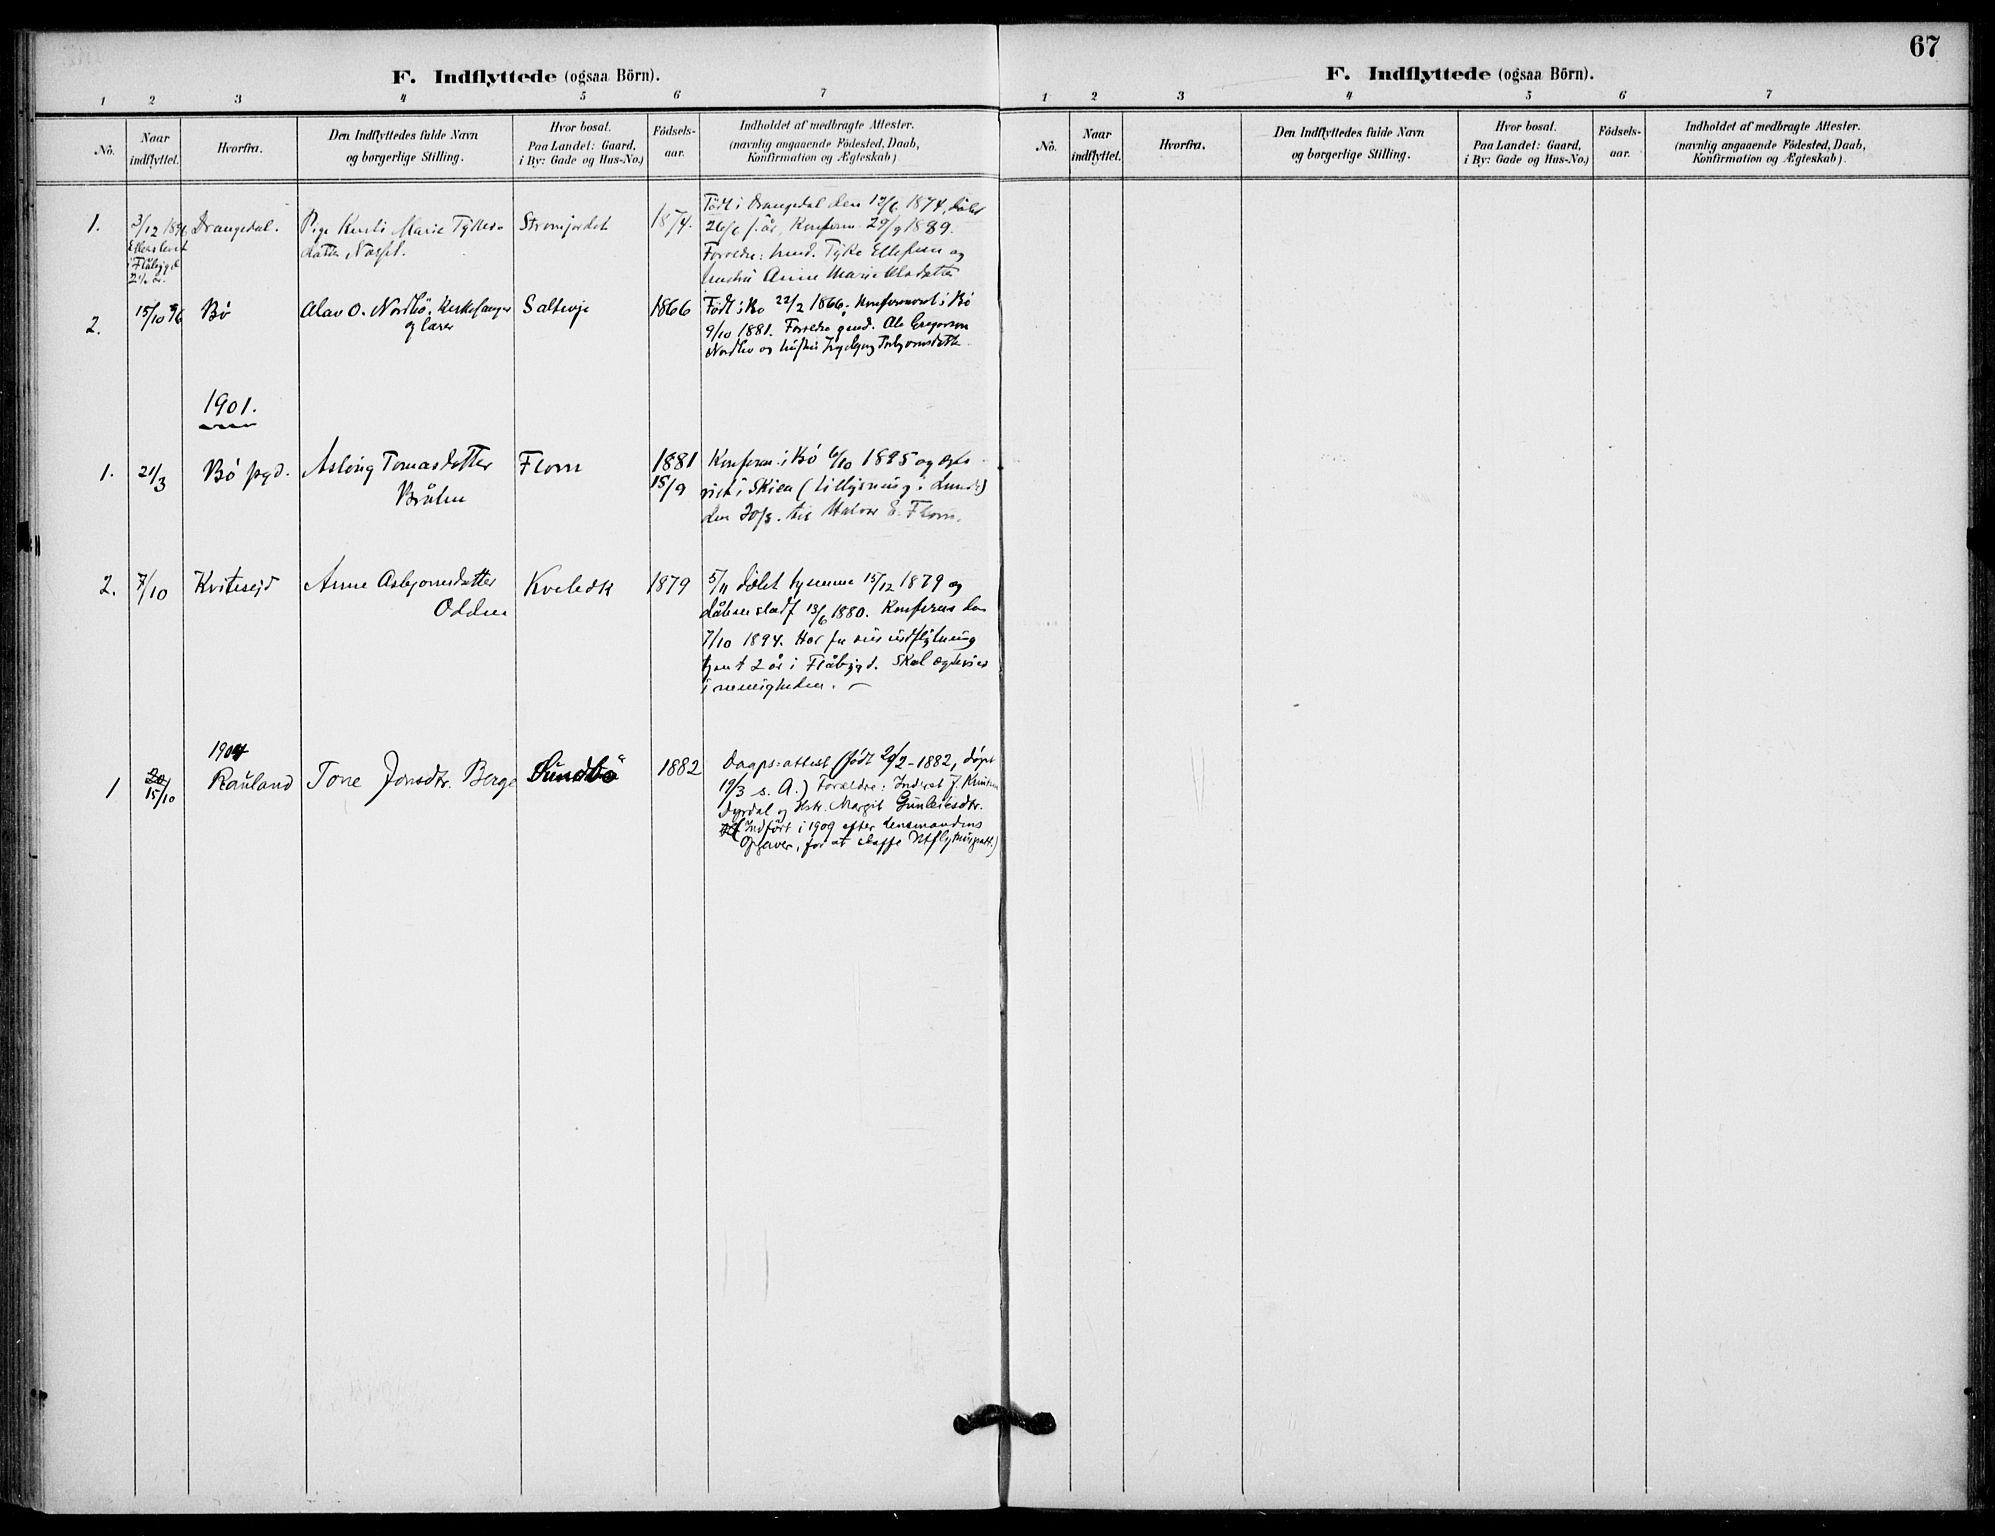 SAKO, Lunde kirkebøker, F/Fb/L0004: Ministerialbok nr. II 4, 1892-1907, s. 67